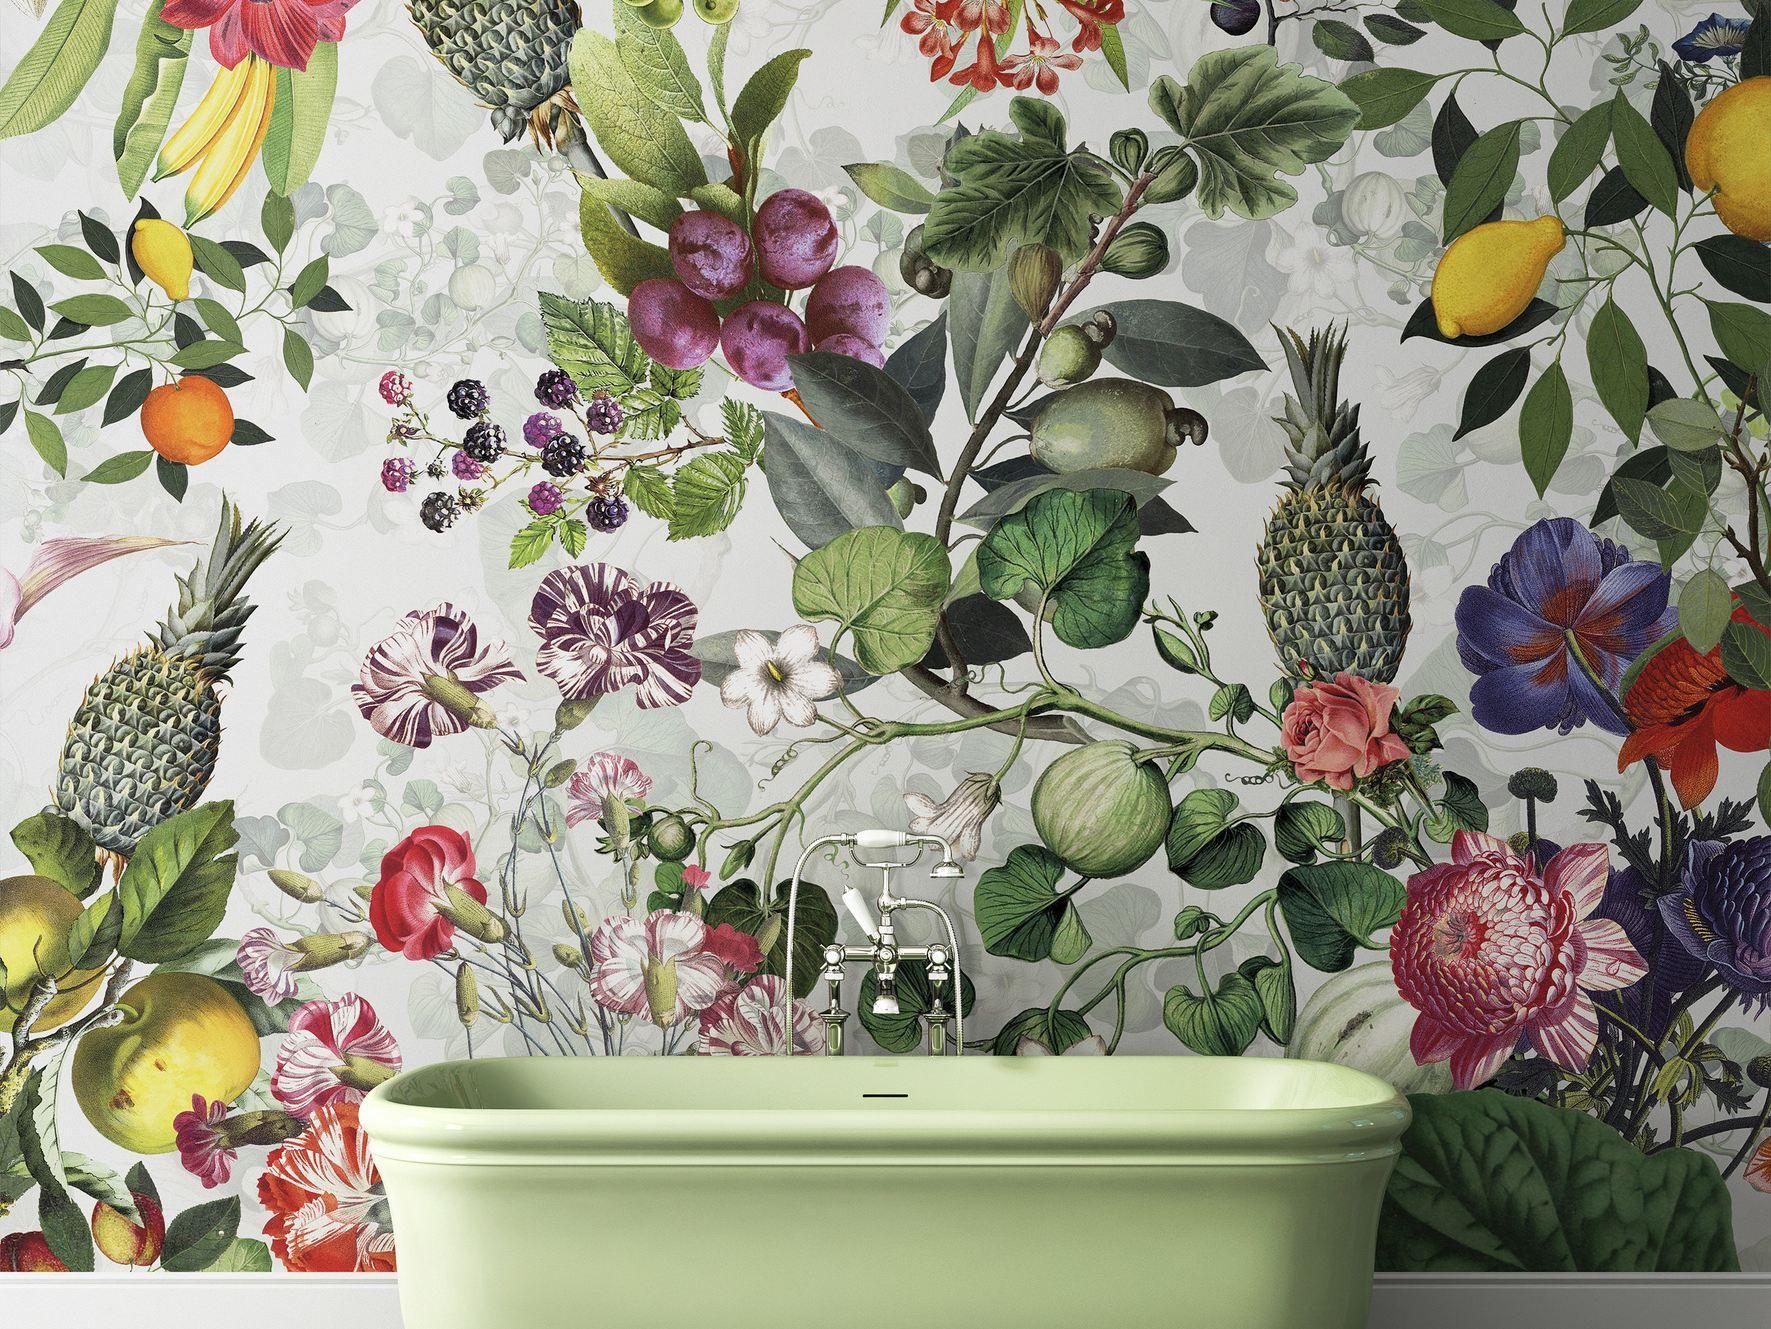 Papel pintado lavable de flores botanica colecci n wallpaper by devon devon dise o vito nesta - Papel pintado lavable ...